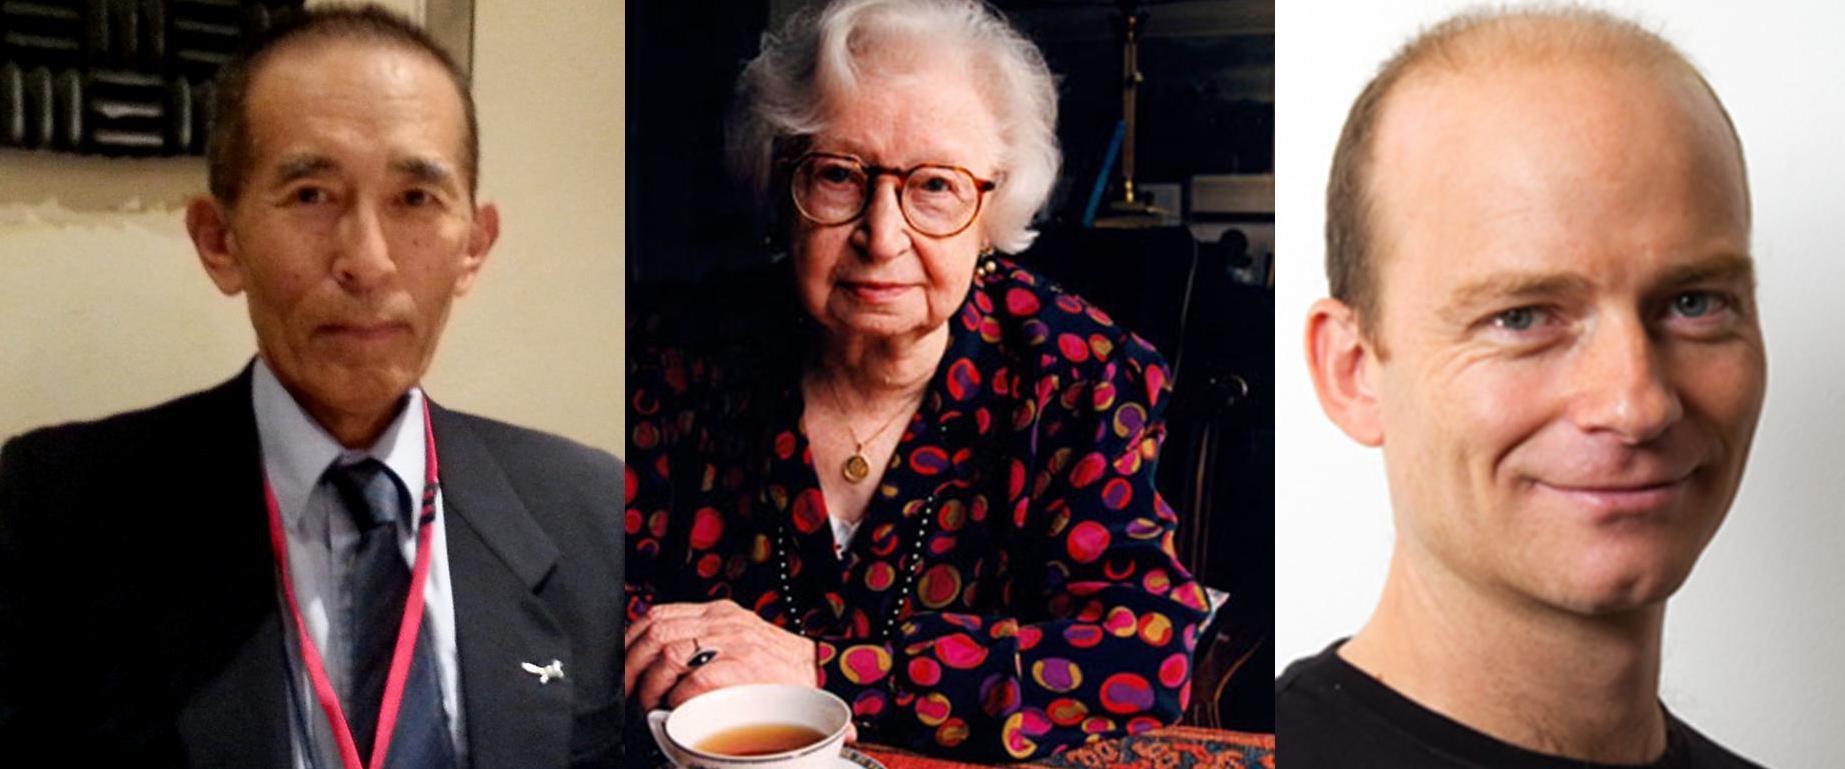 Caption: Soh Horie / Miep Gies / Jamie Drummond